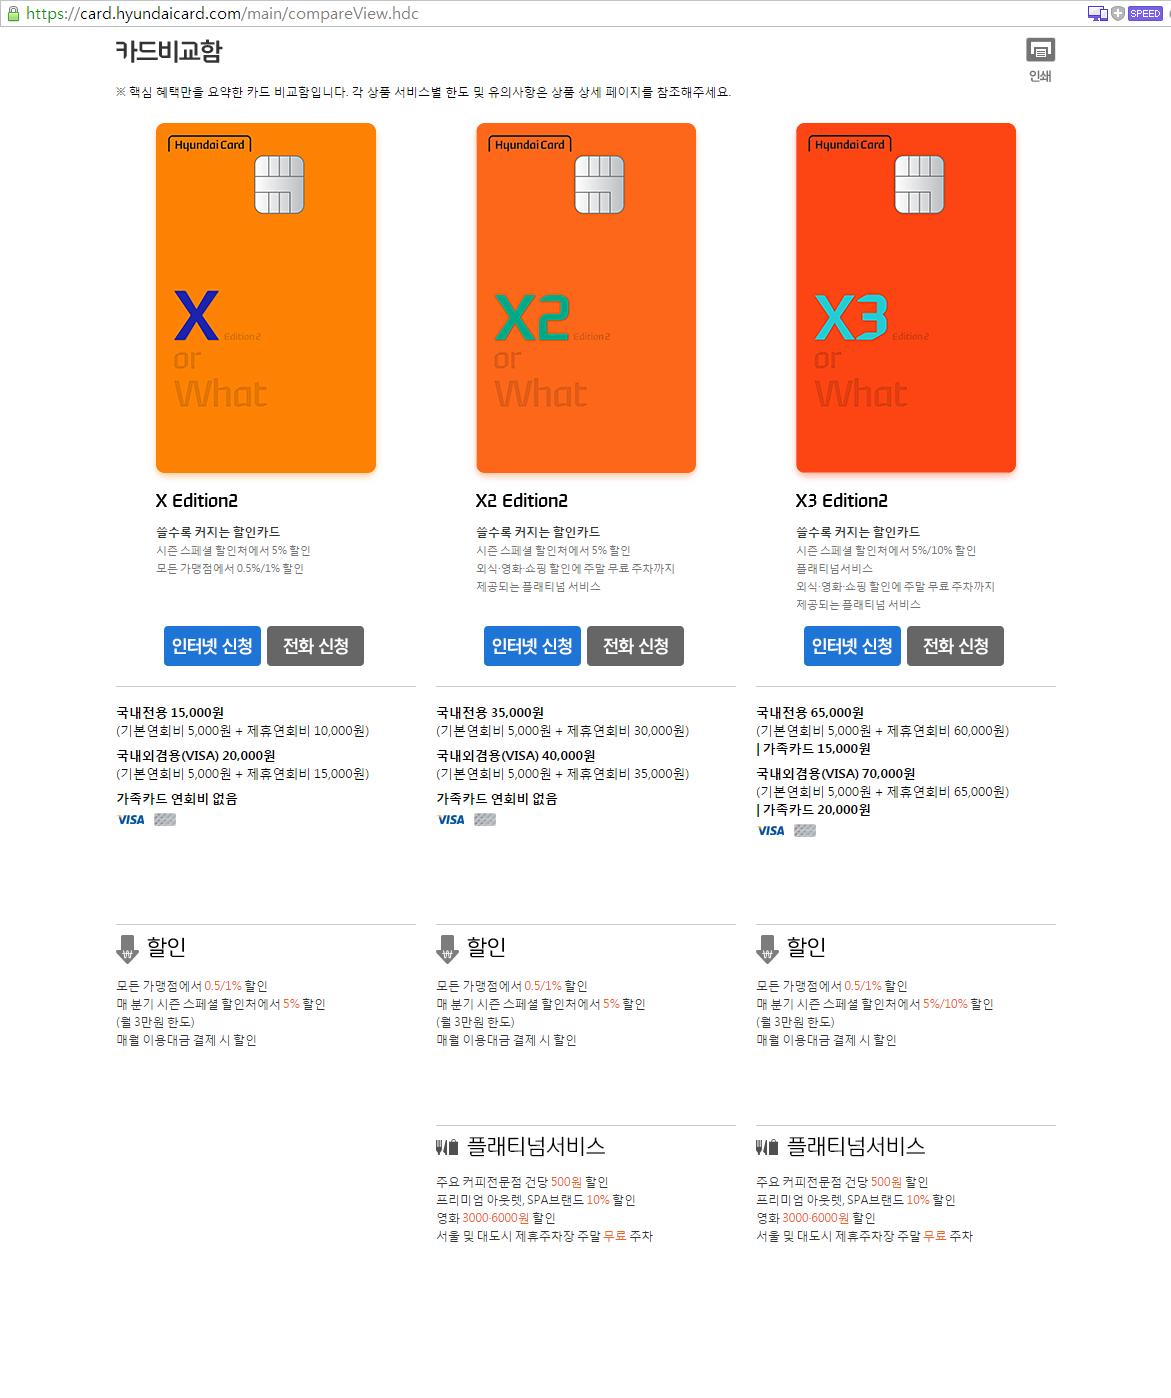 X카드 요약.png